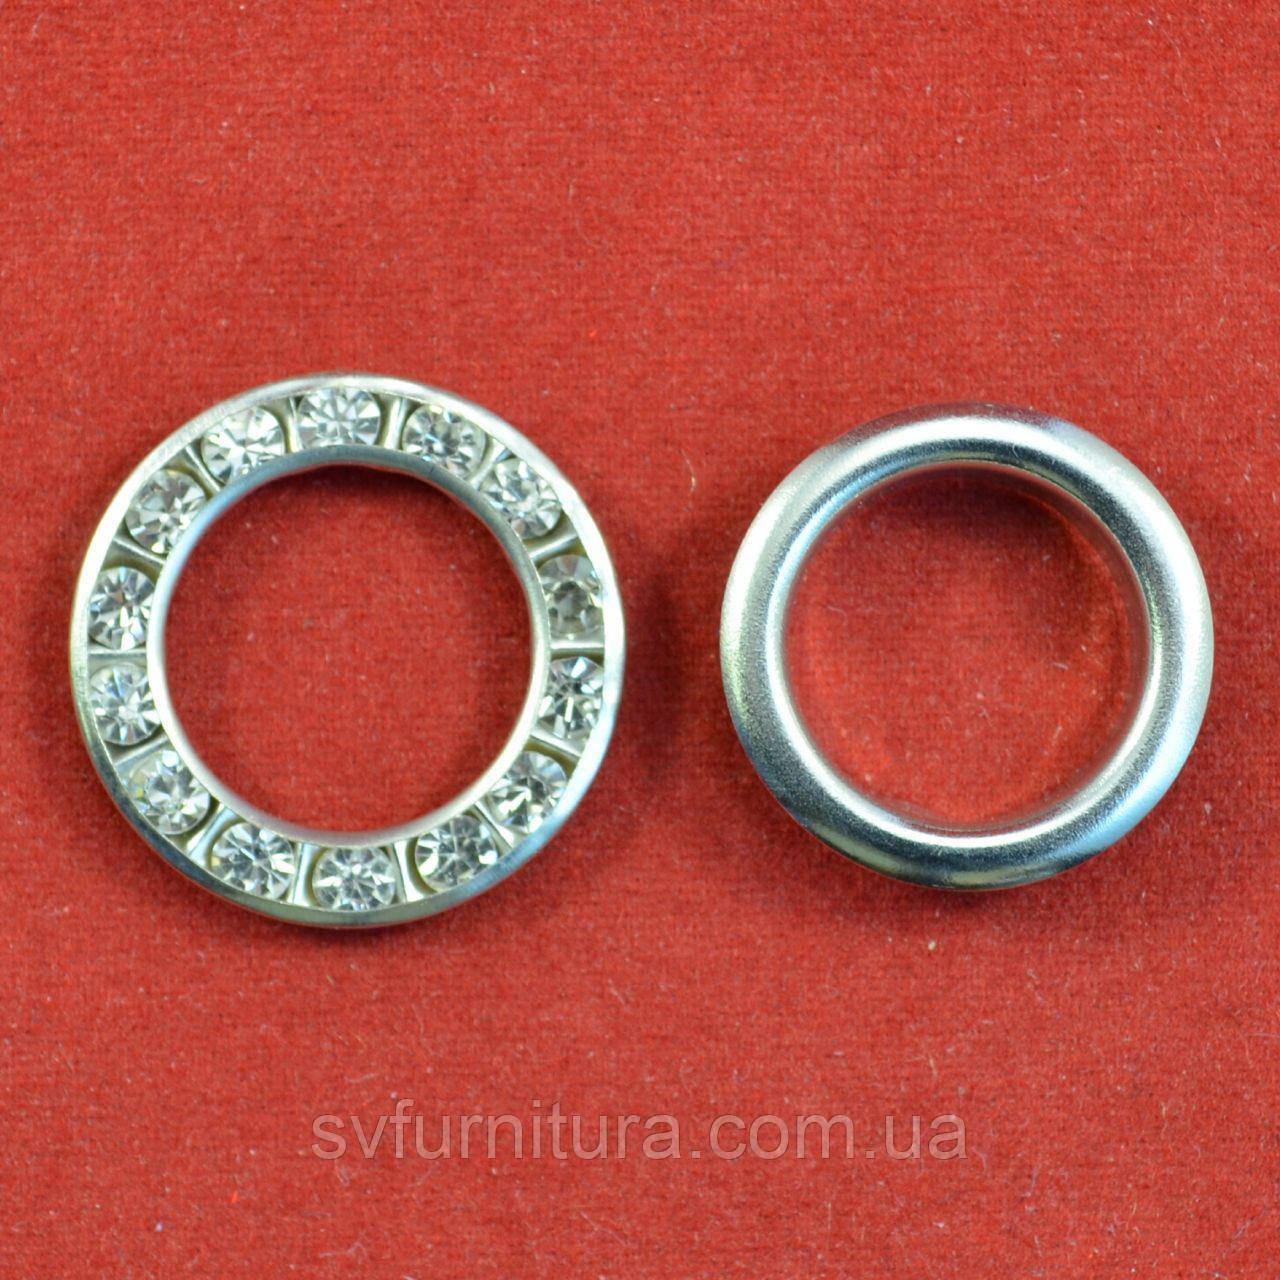 Блочка К 800 серебро